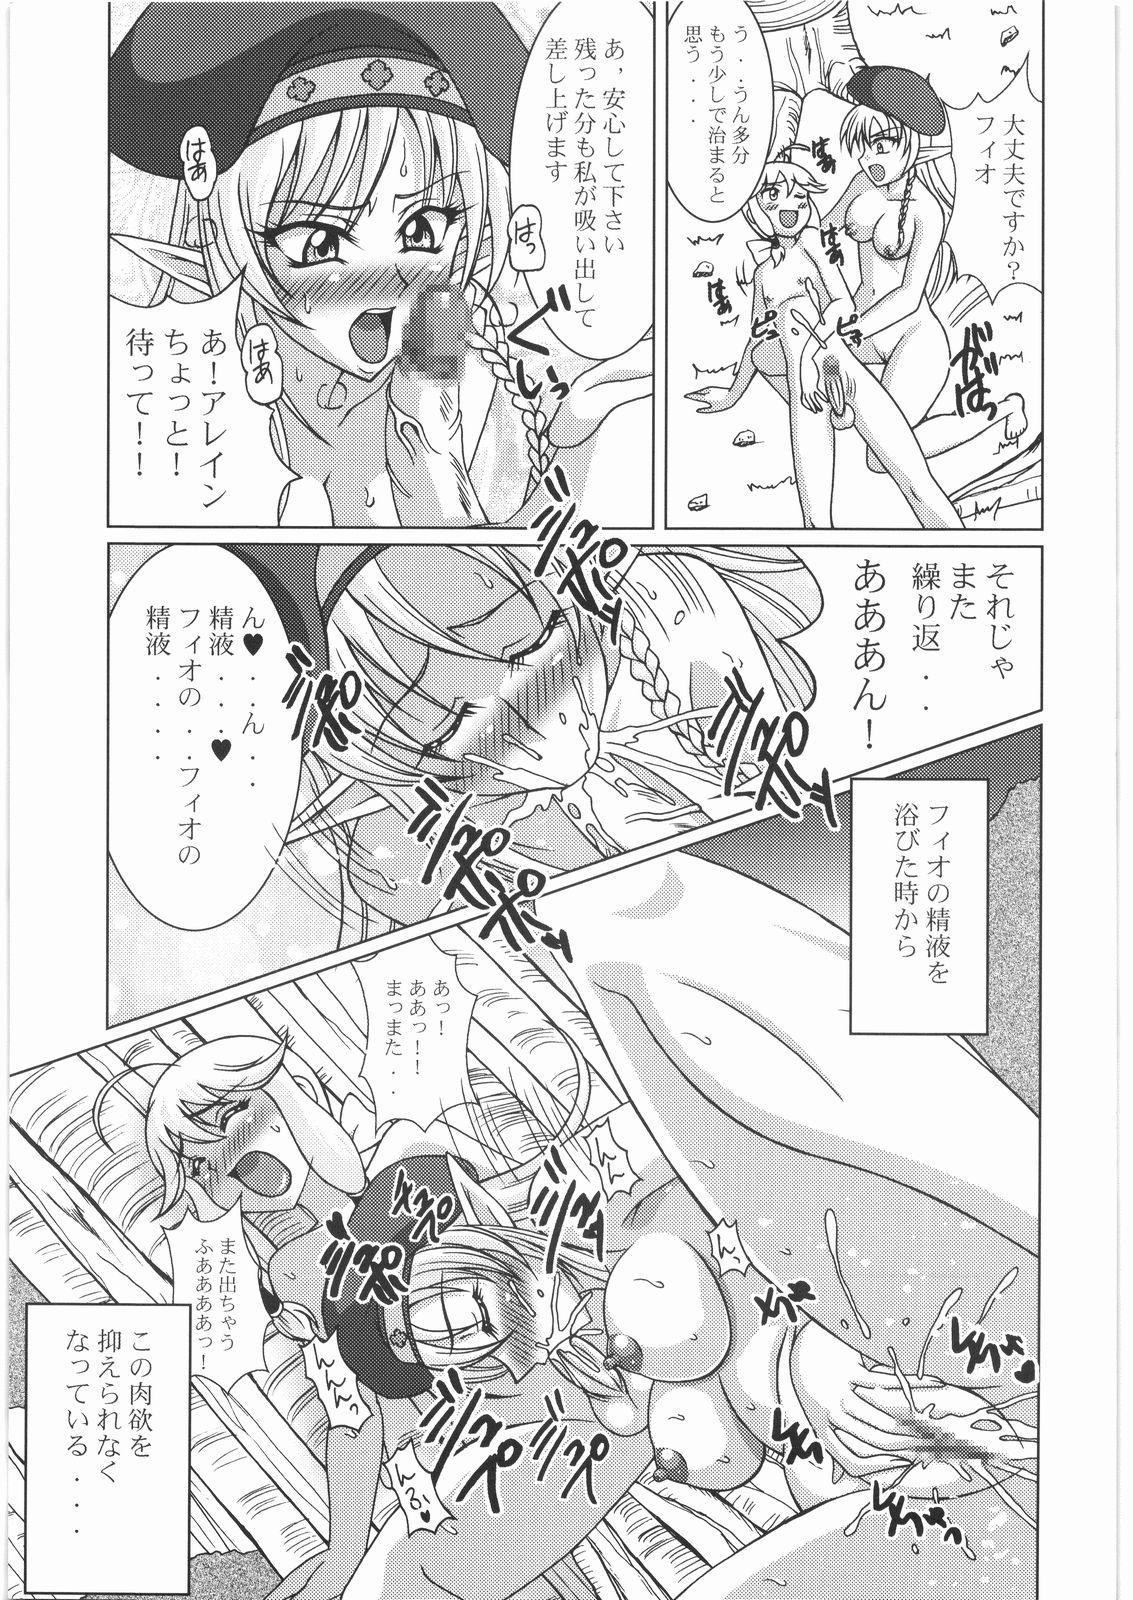 Strike Kyoukan 7